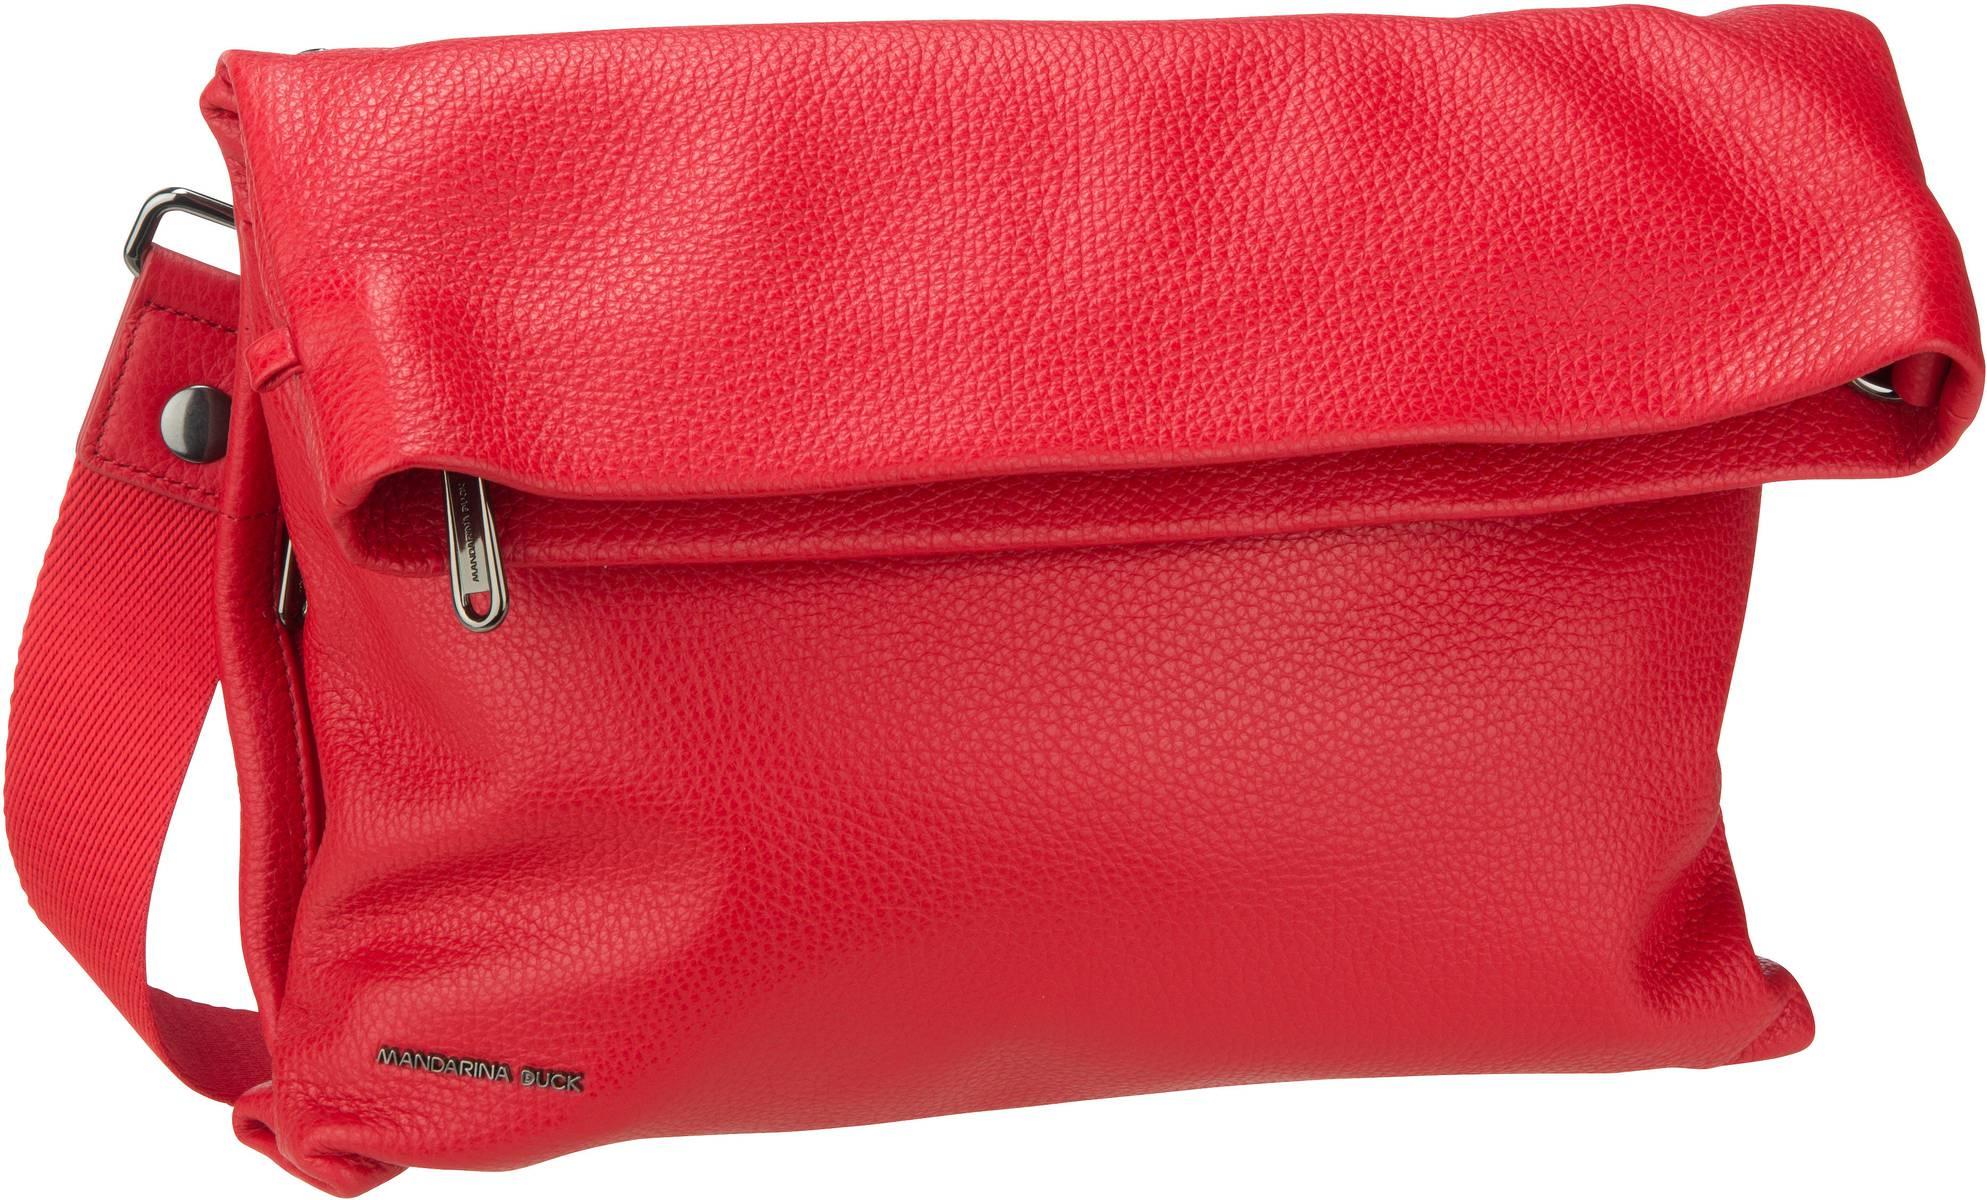 Umhängetasche Mellow Leather Schultertasche Flame Scarlet (innen: Grau)